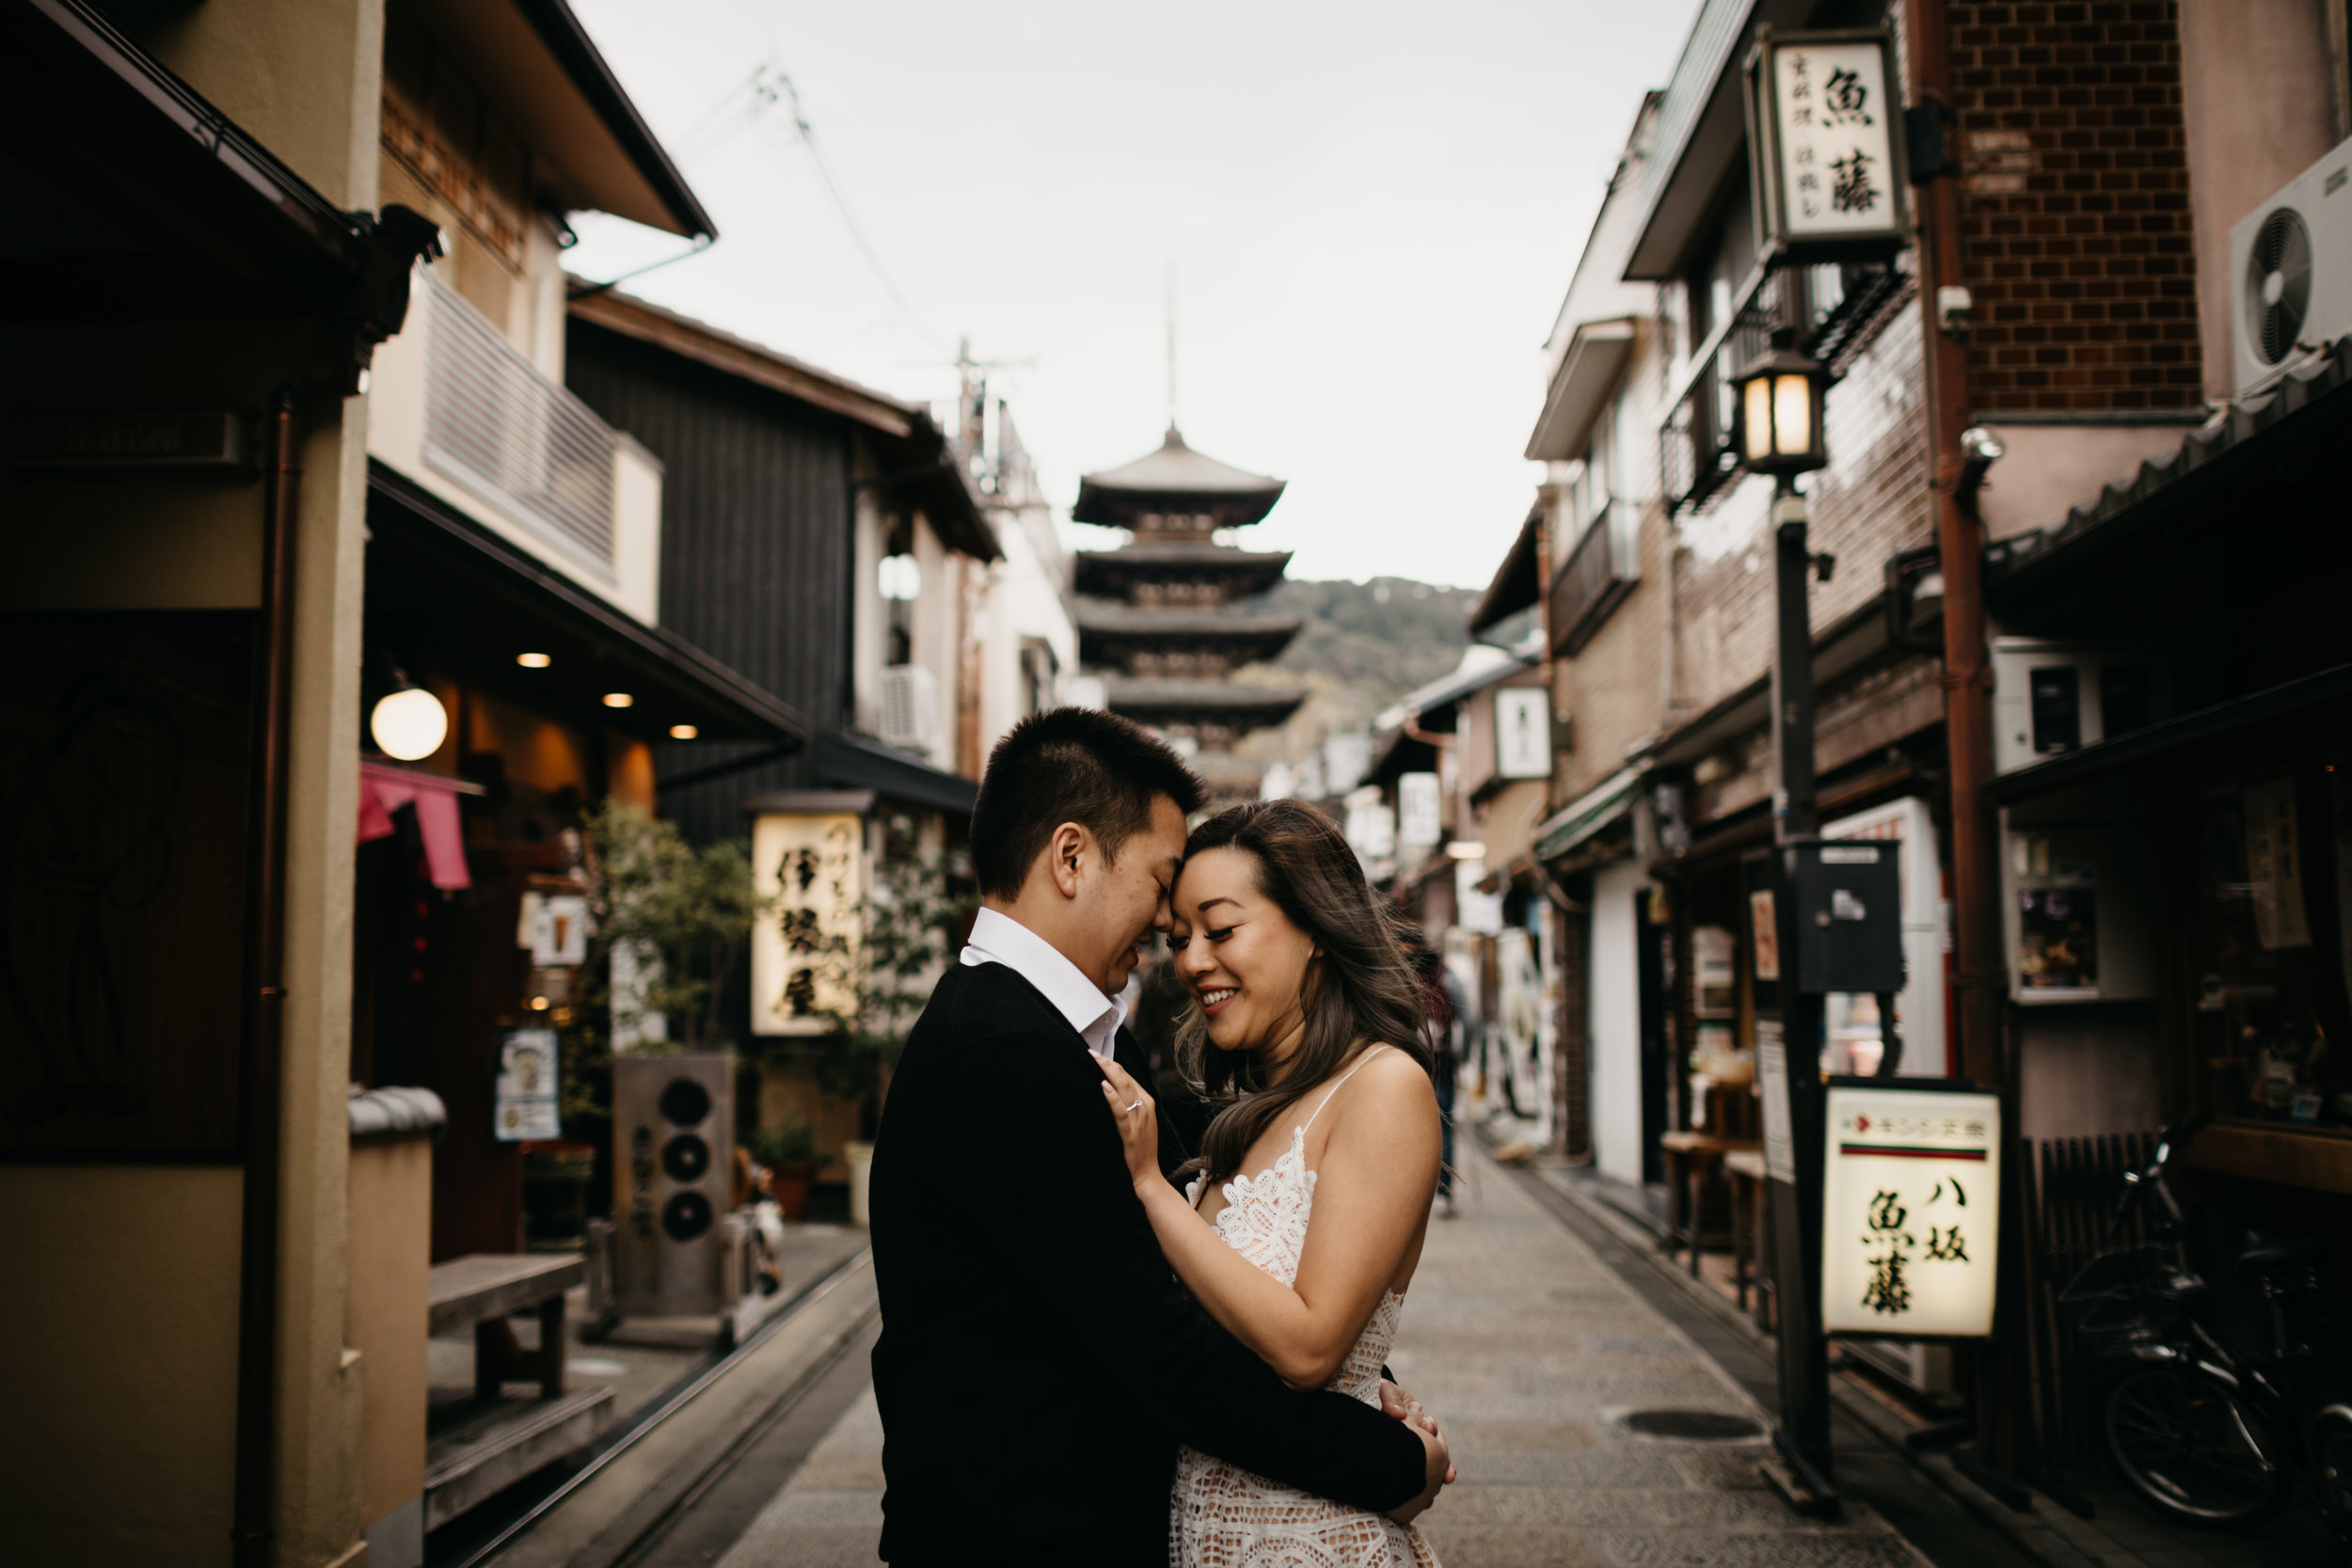 Kyoto-Engagement-photo-by-samantha-look.jpg